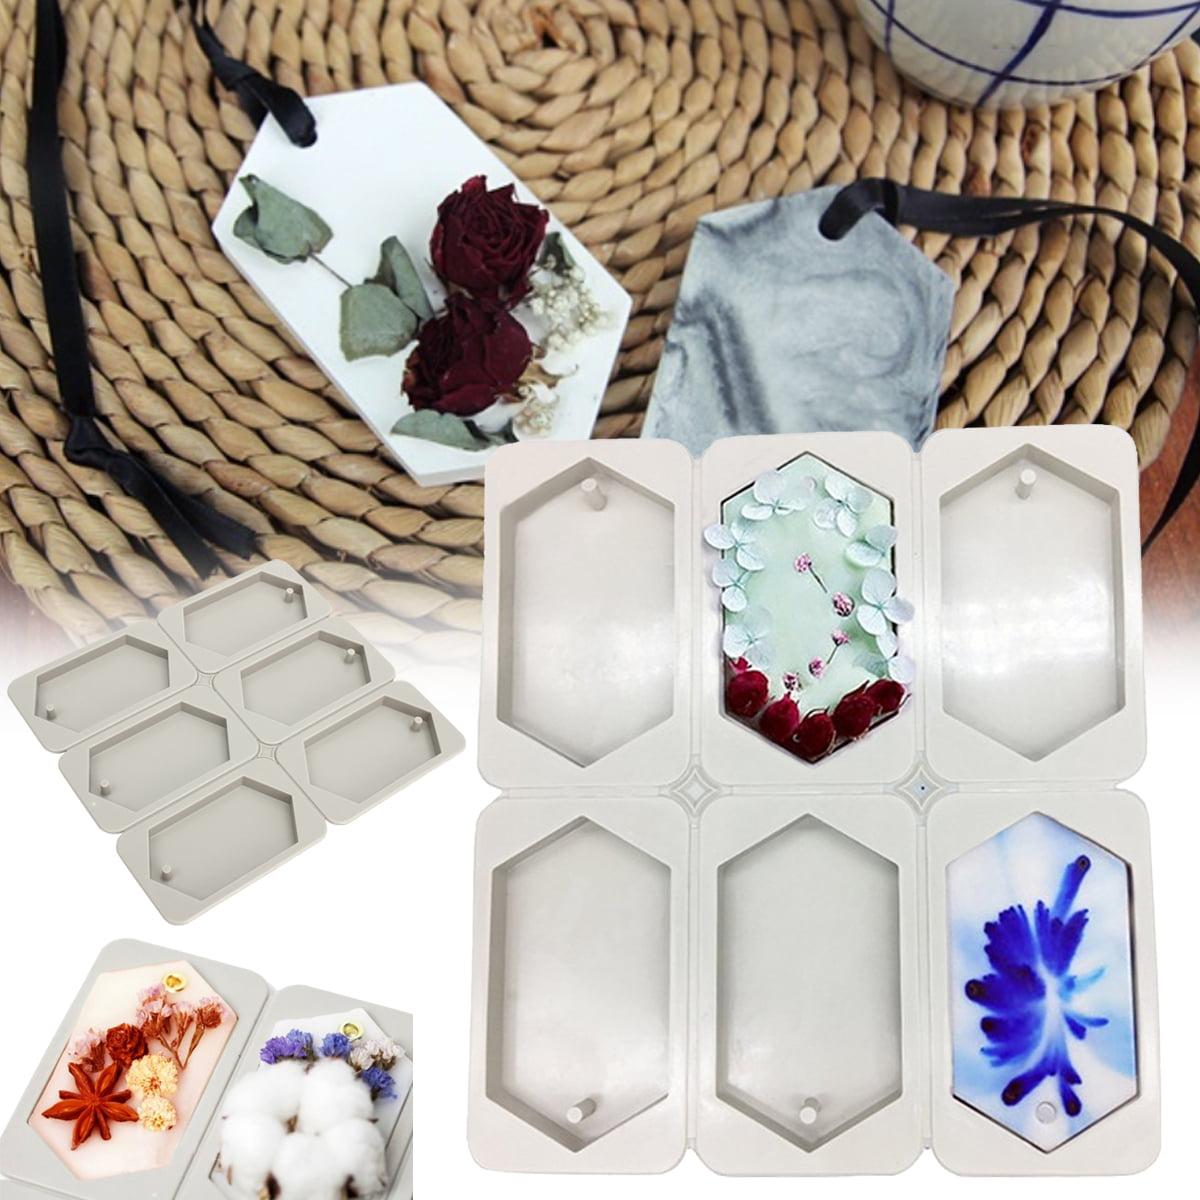 Bathroom Accessories & Décor for Bathroom Sets | Walmart ...